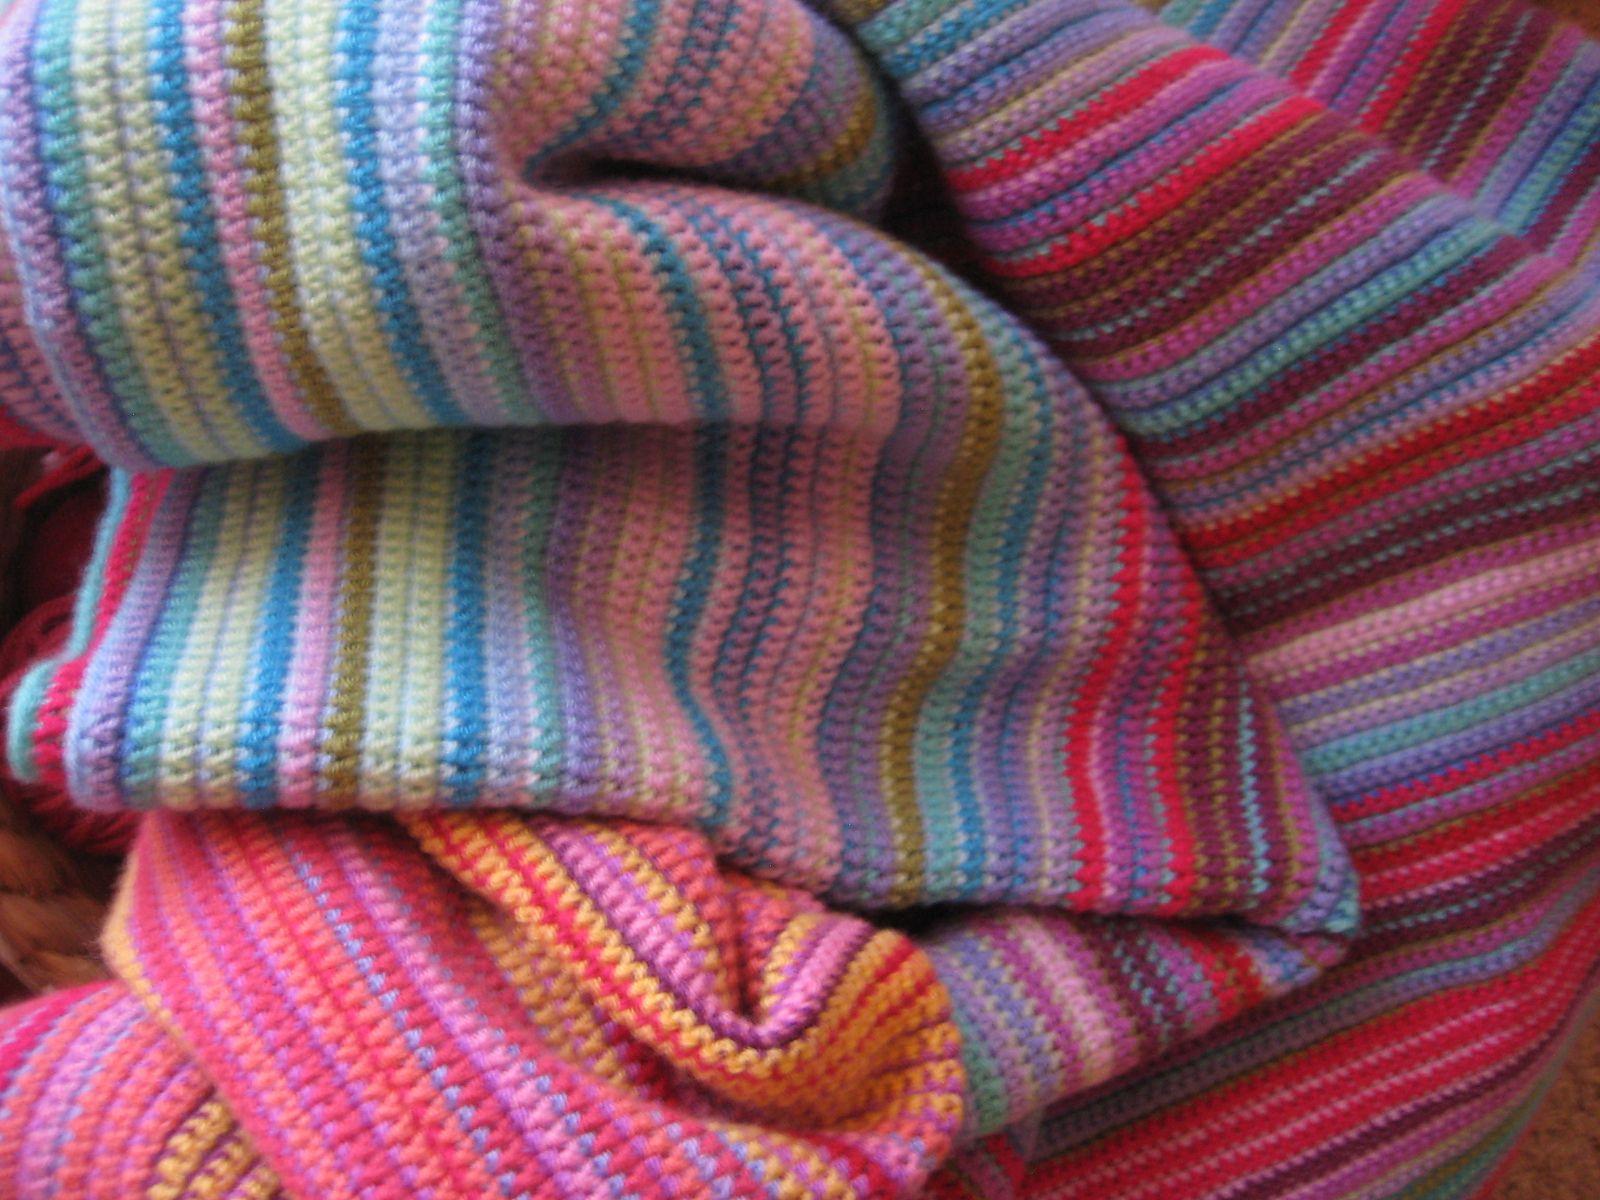 A Block Stitch Temperaturemood Blanketscarf - The 8Th Gem